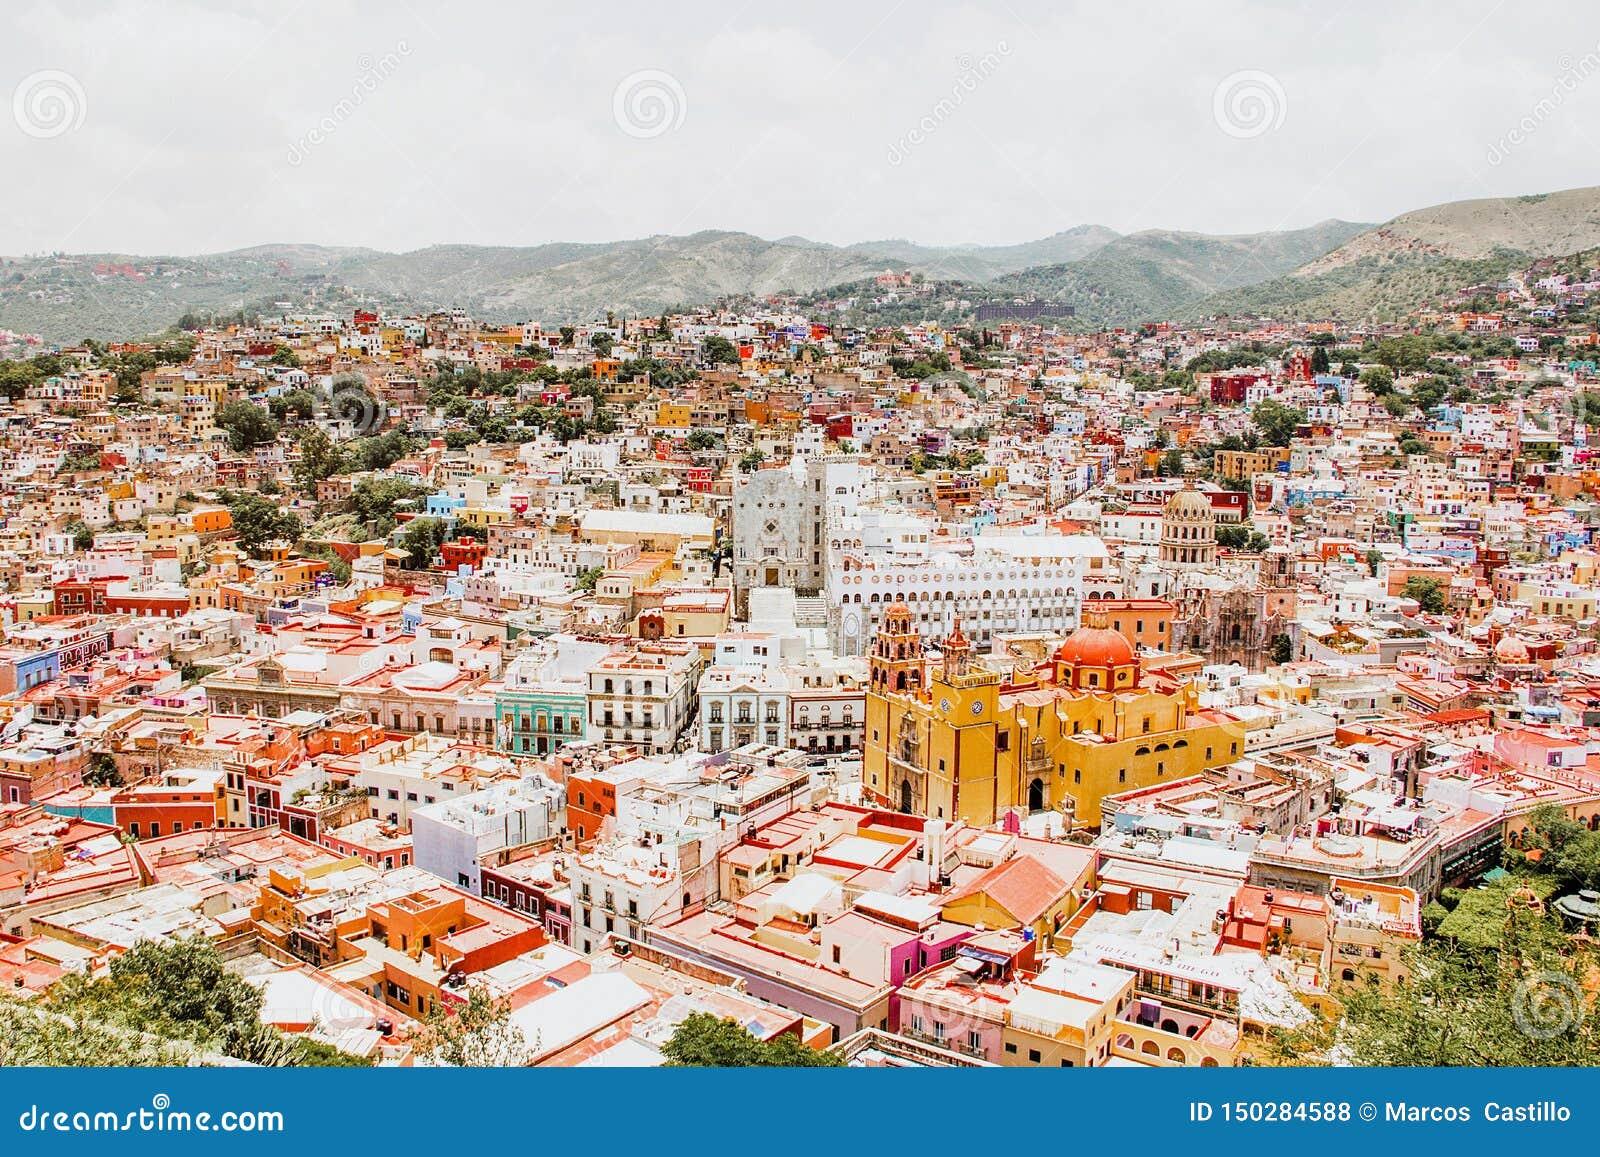 Guanajuato México, vista de uma cidade mexicana colorida